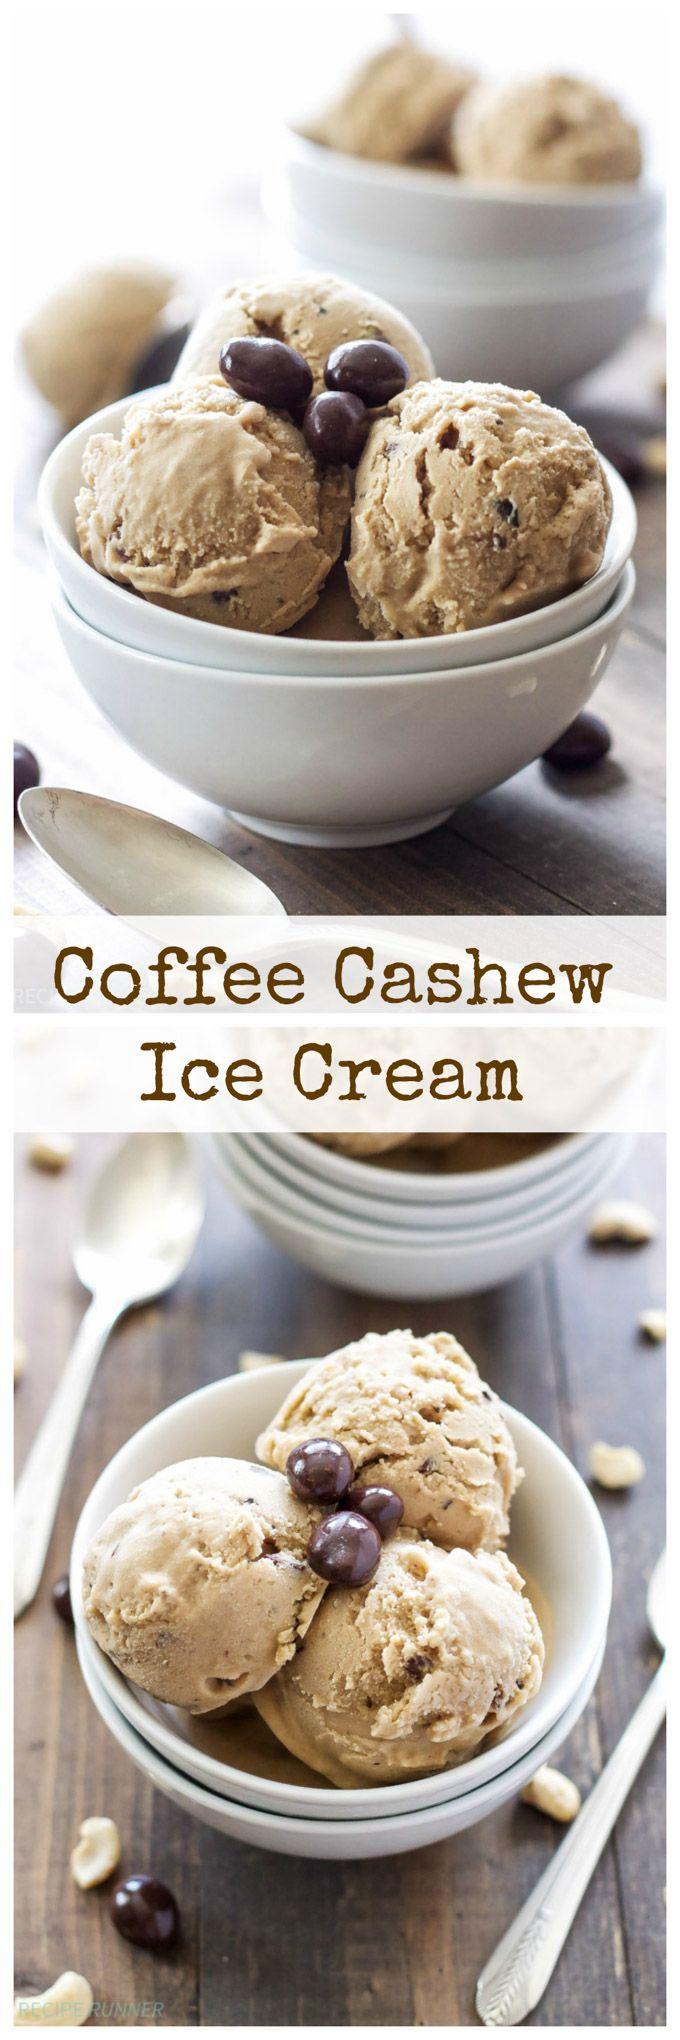 Coffee Cashew Ice Cream   You'll never suspect this Coffee Cashew Ice Cream is dairy-free and vegan! #ad